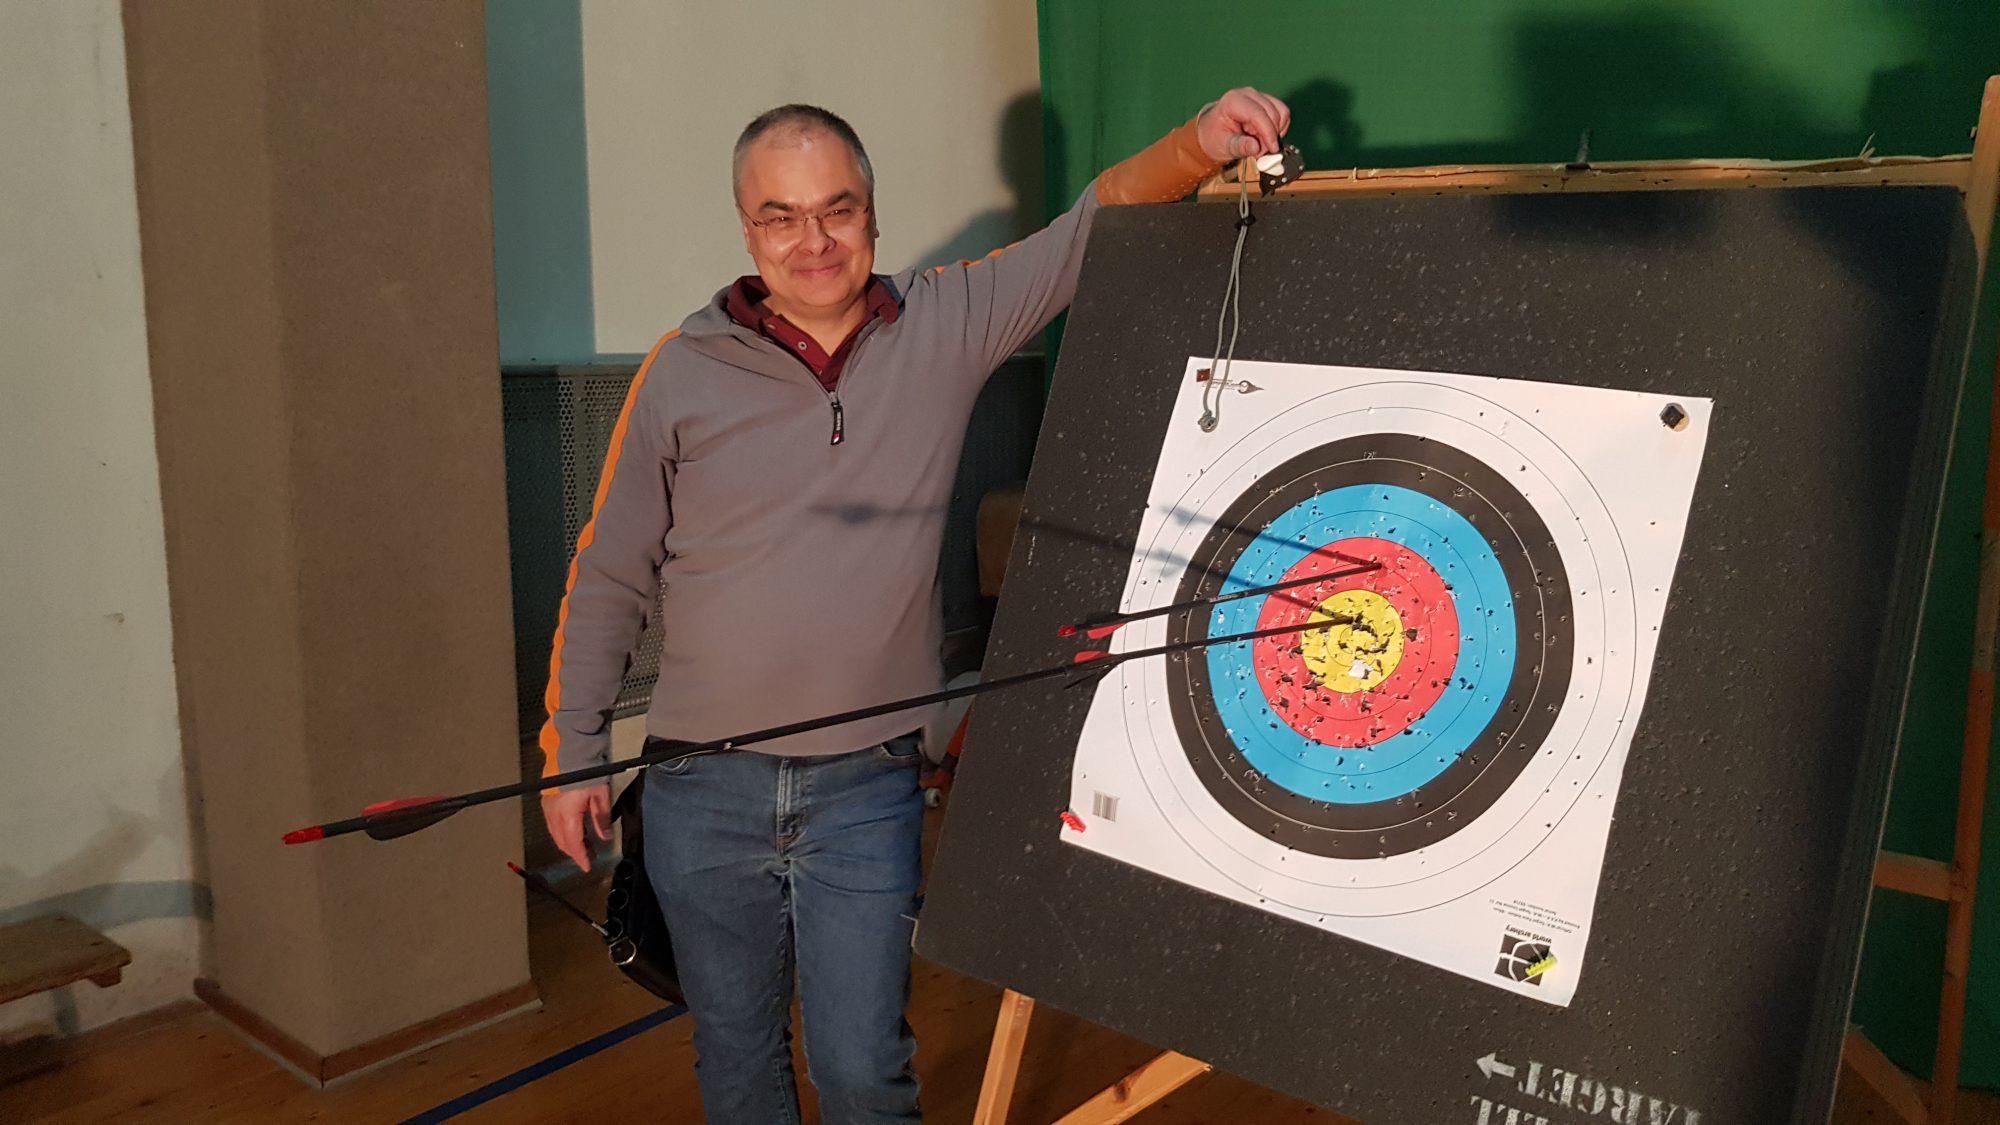 Robin Hood zu Gast in Radeberg